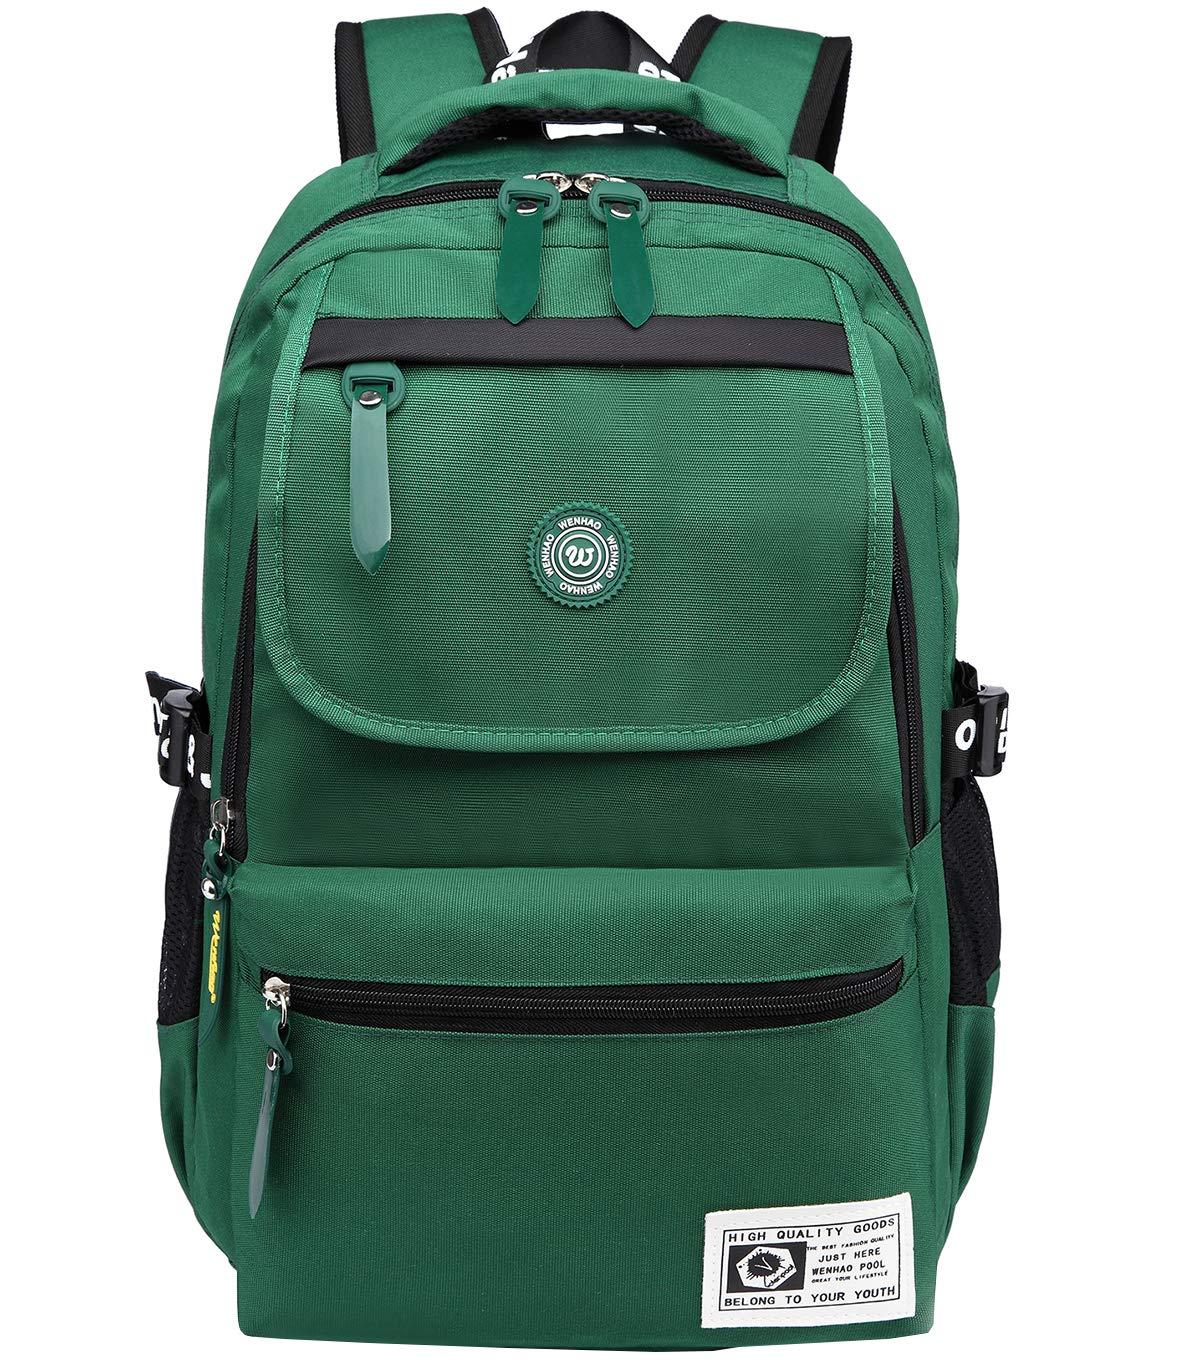 Mochila escolar para niñas mochila escolar para niños de negocios portátil Mochila de la vida impermeable mochila escolar senderismo mochila deporte bolsa ...